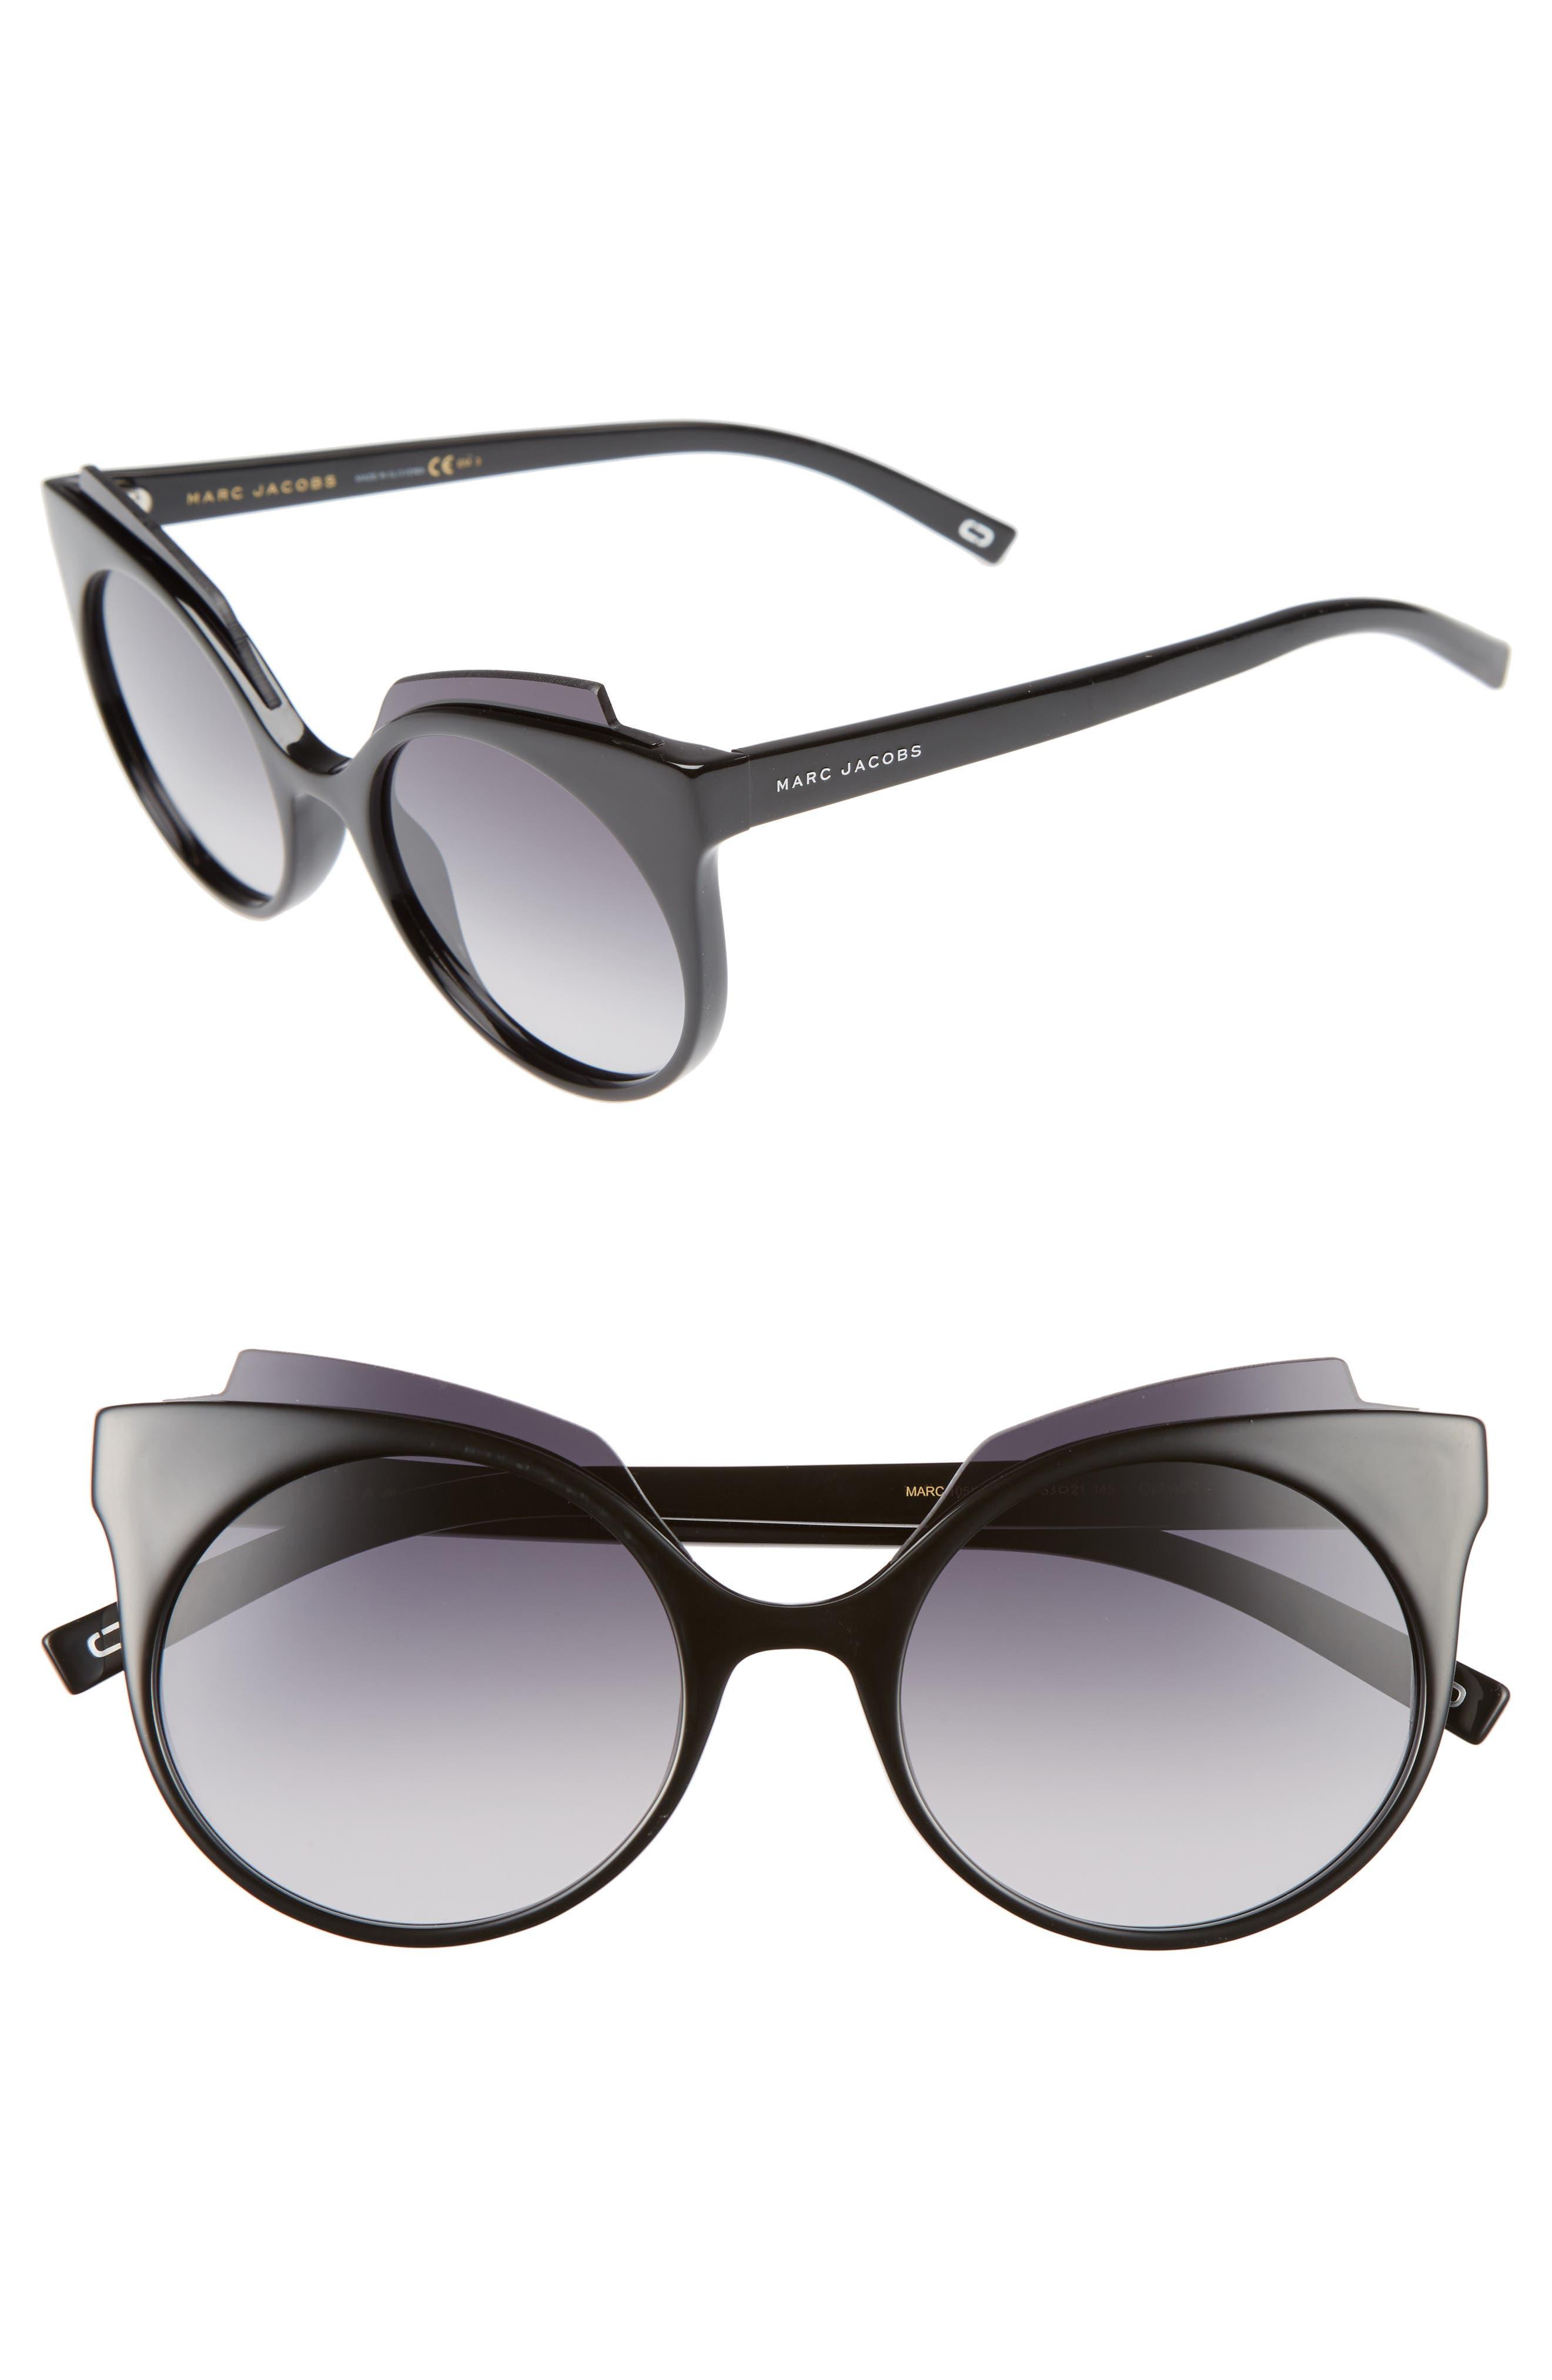 53mm Oversized Sunglasses,                             Main thumbnail 1, color,                             001